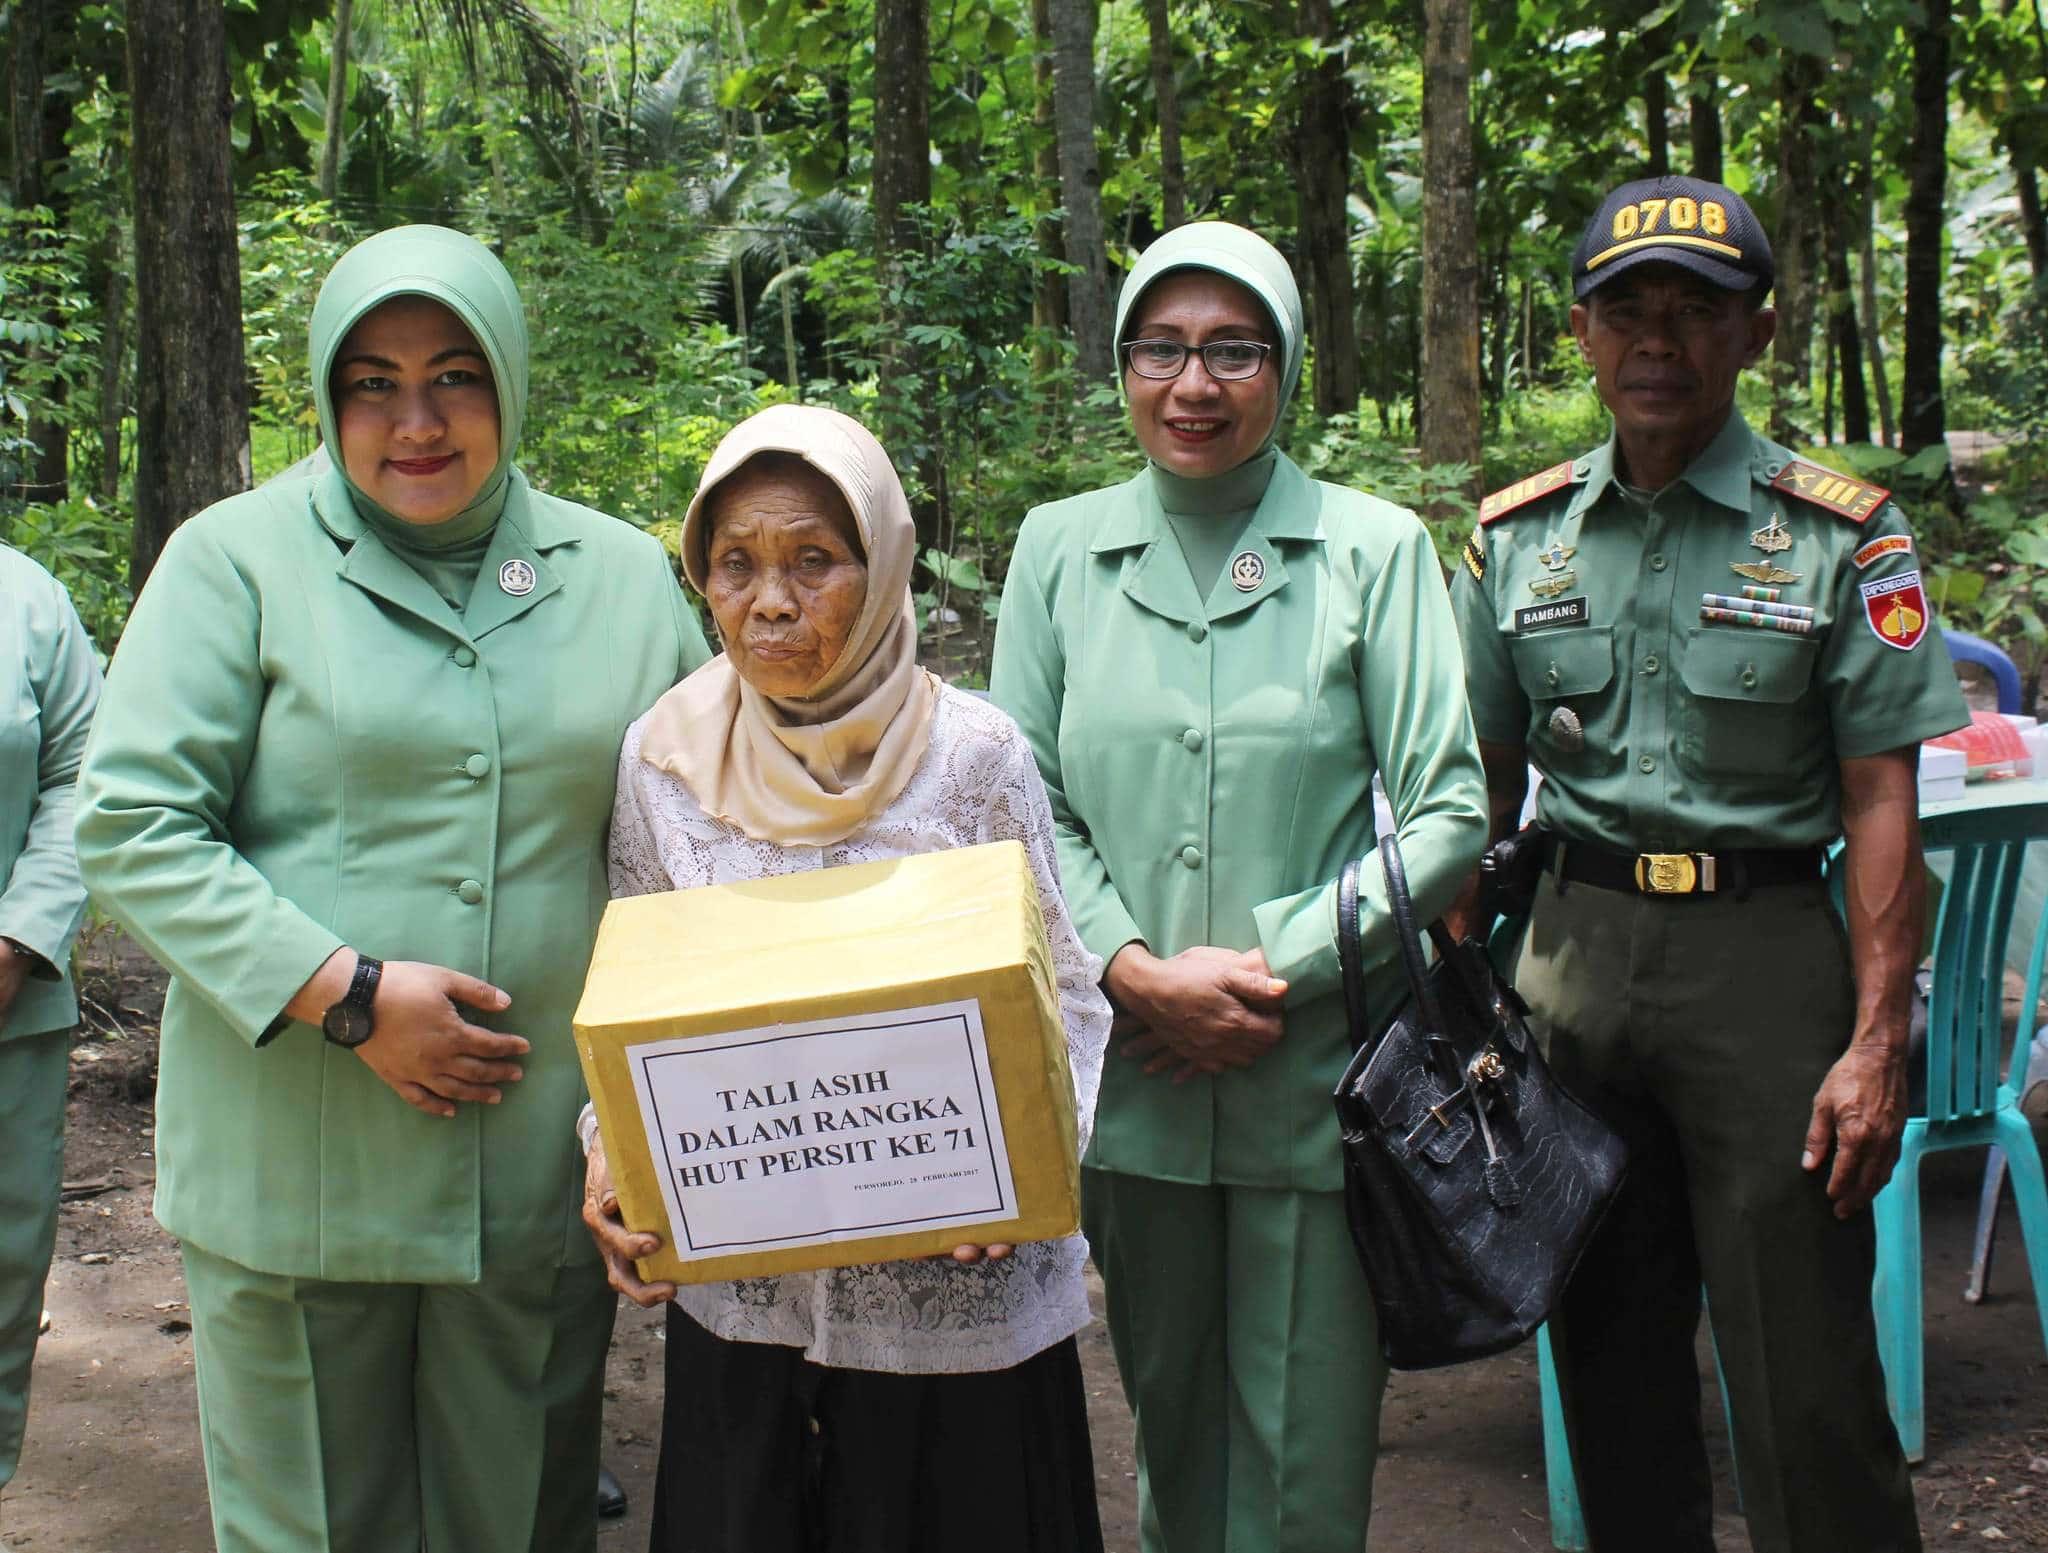 Sambut HUT Persit ke 71, Persit Kodim Purworejo Peduli Dengan Sesama